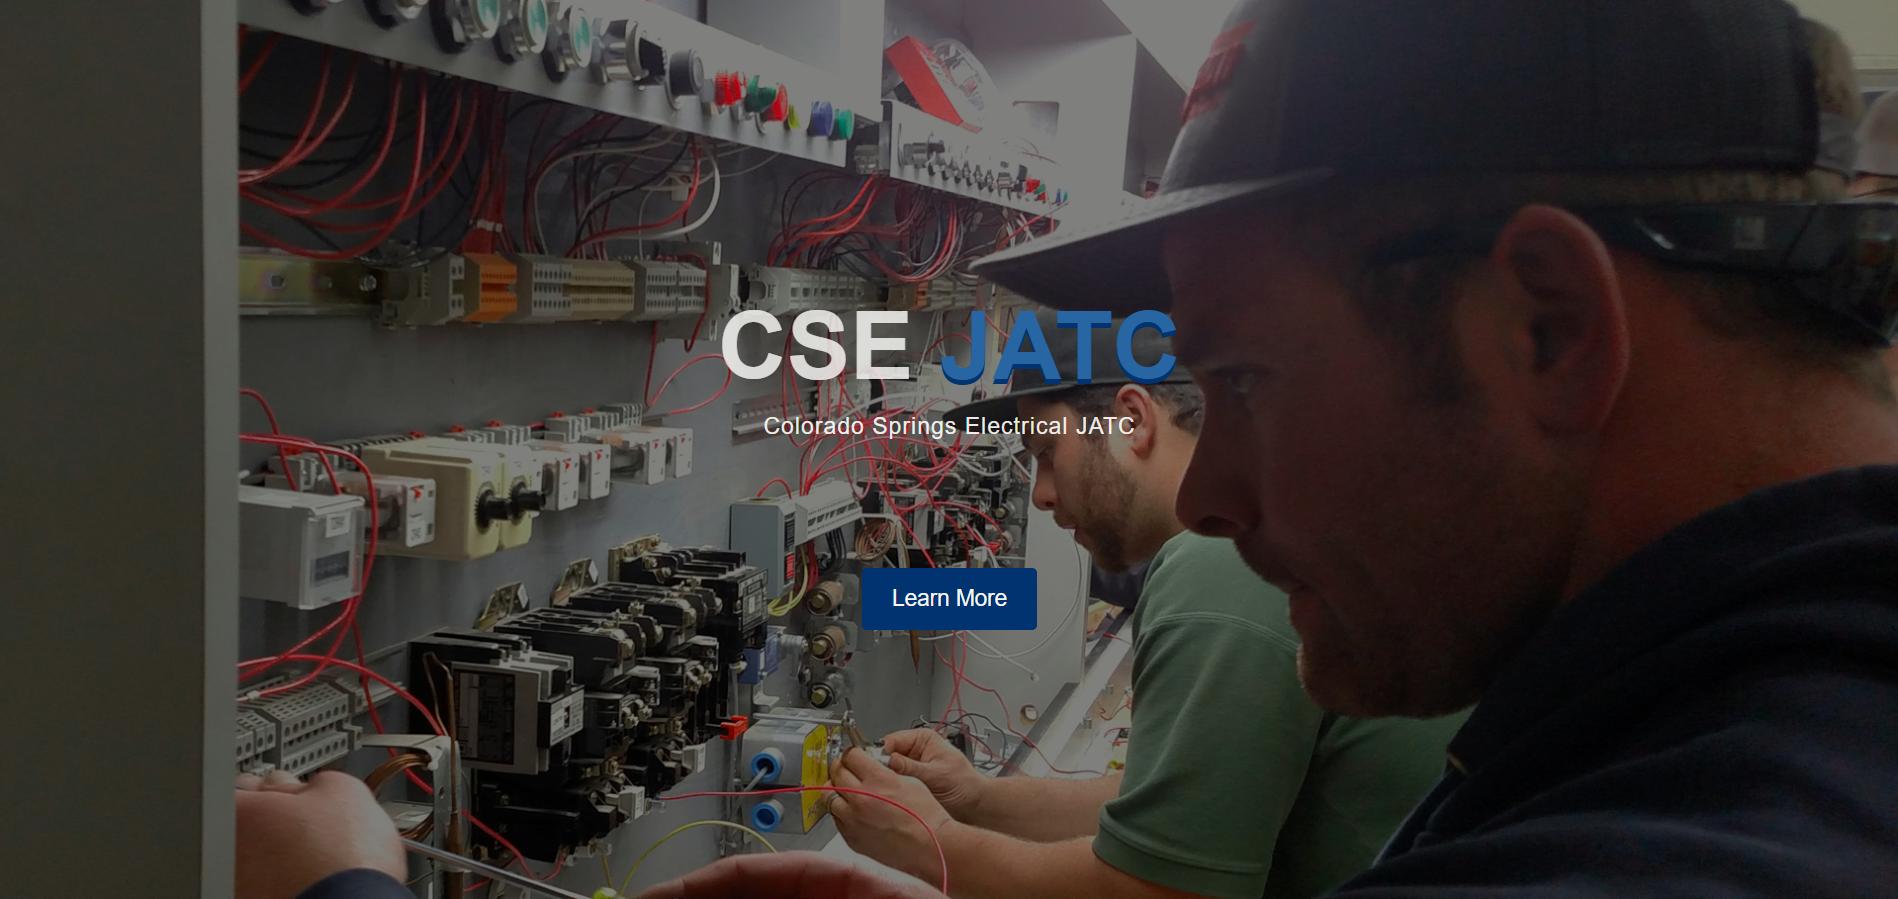 colorado springs electrical jatc